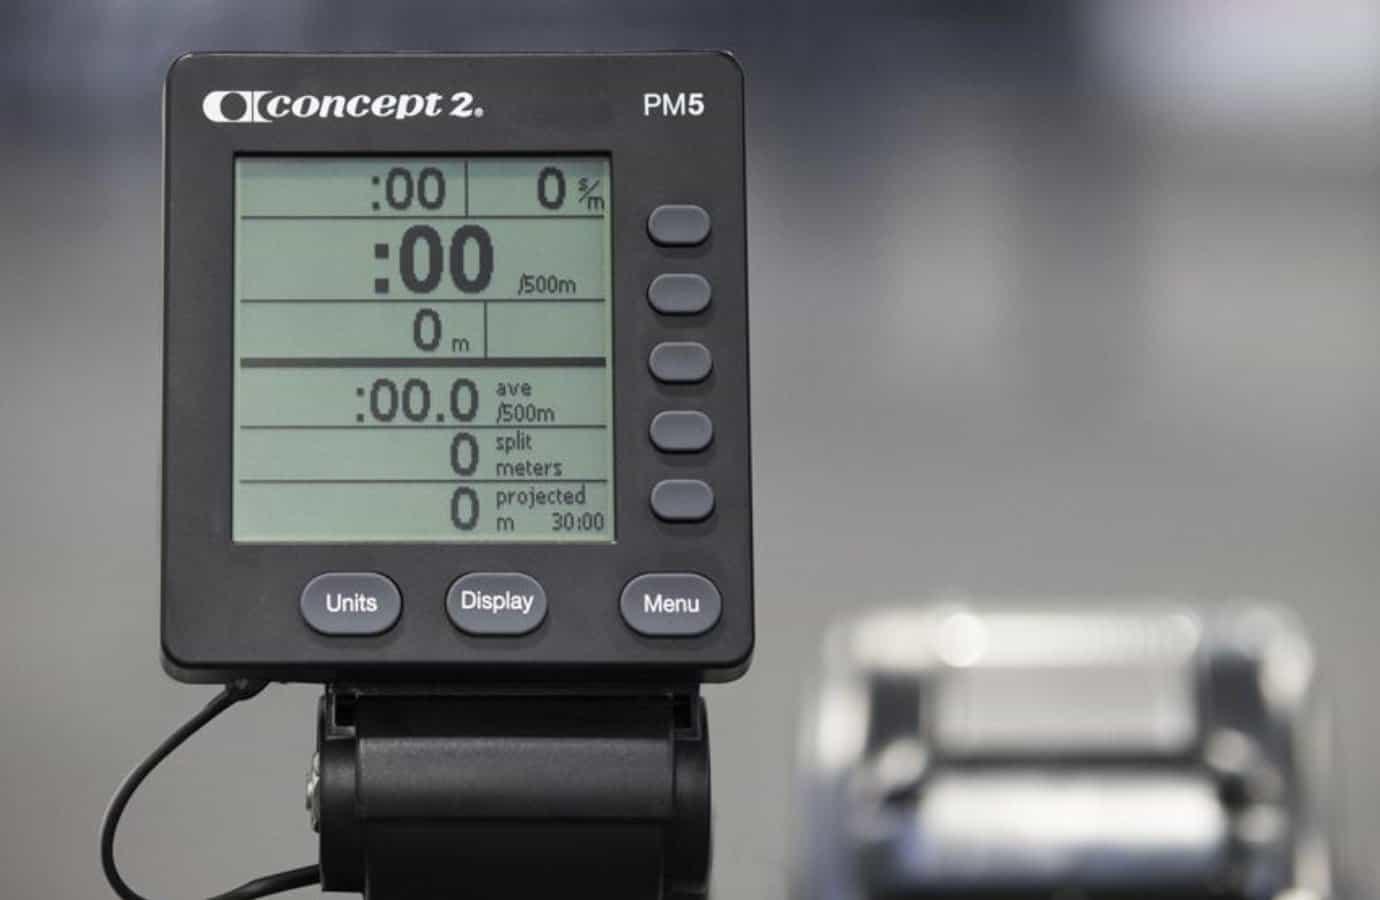 Concept2 Модель D PM5 Размер